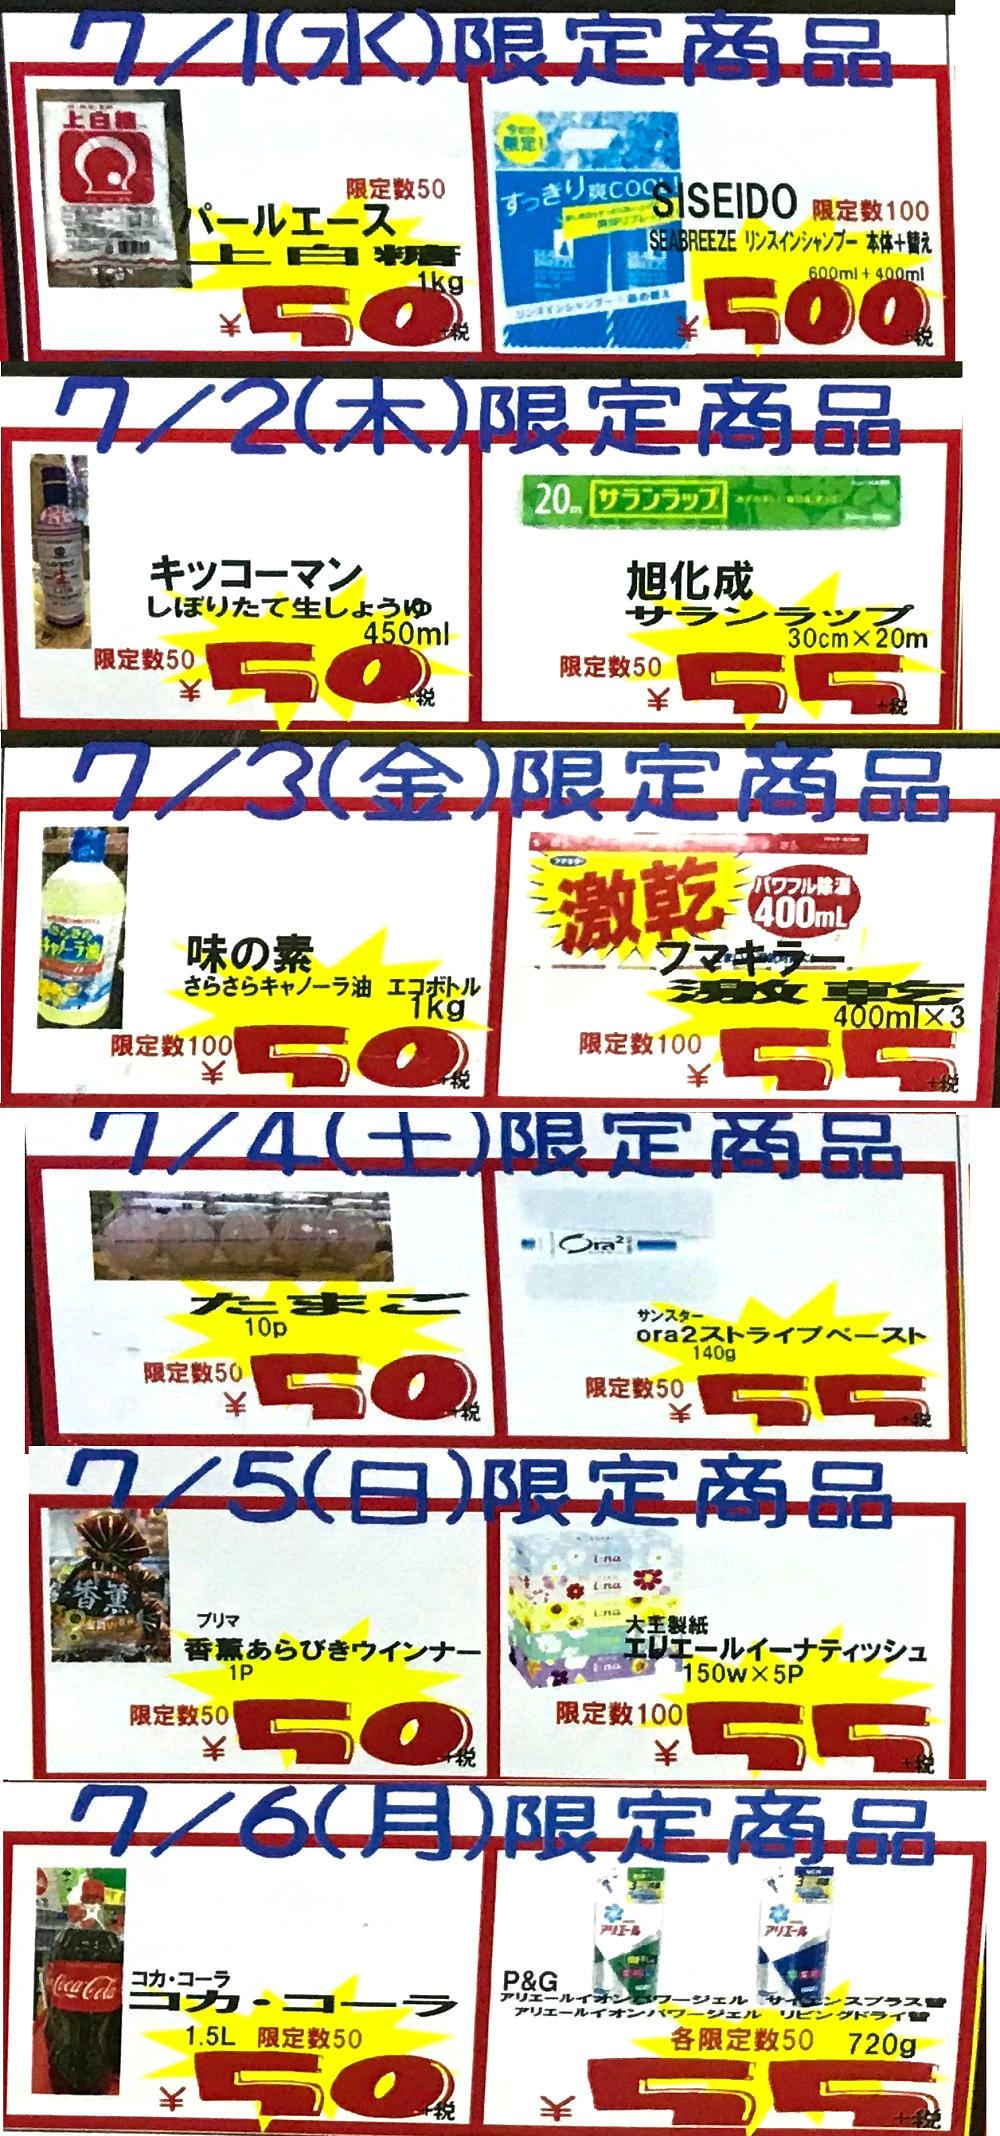 MEGAドン・キホーテ成田店の『オープン5周年記念セール』